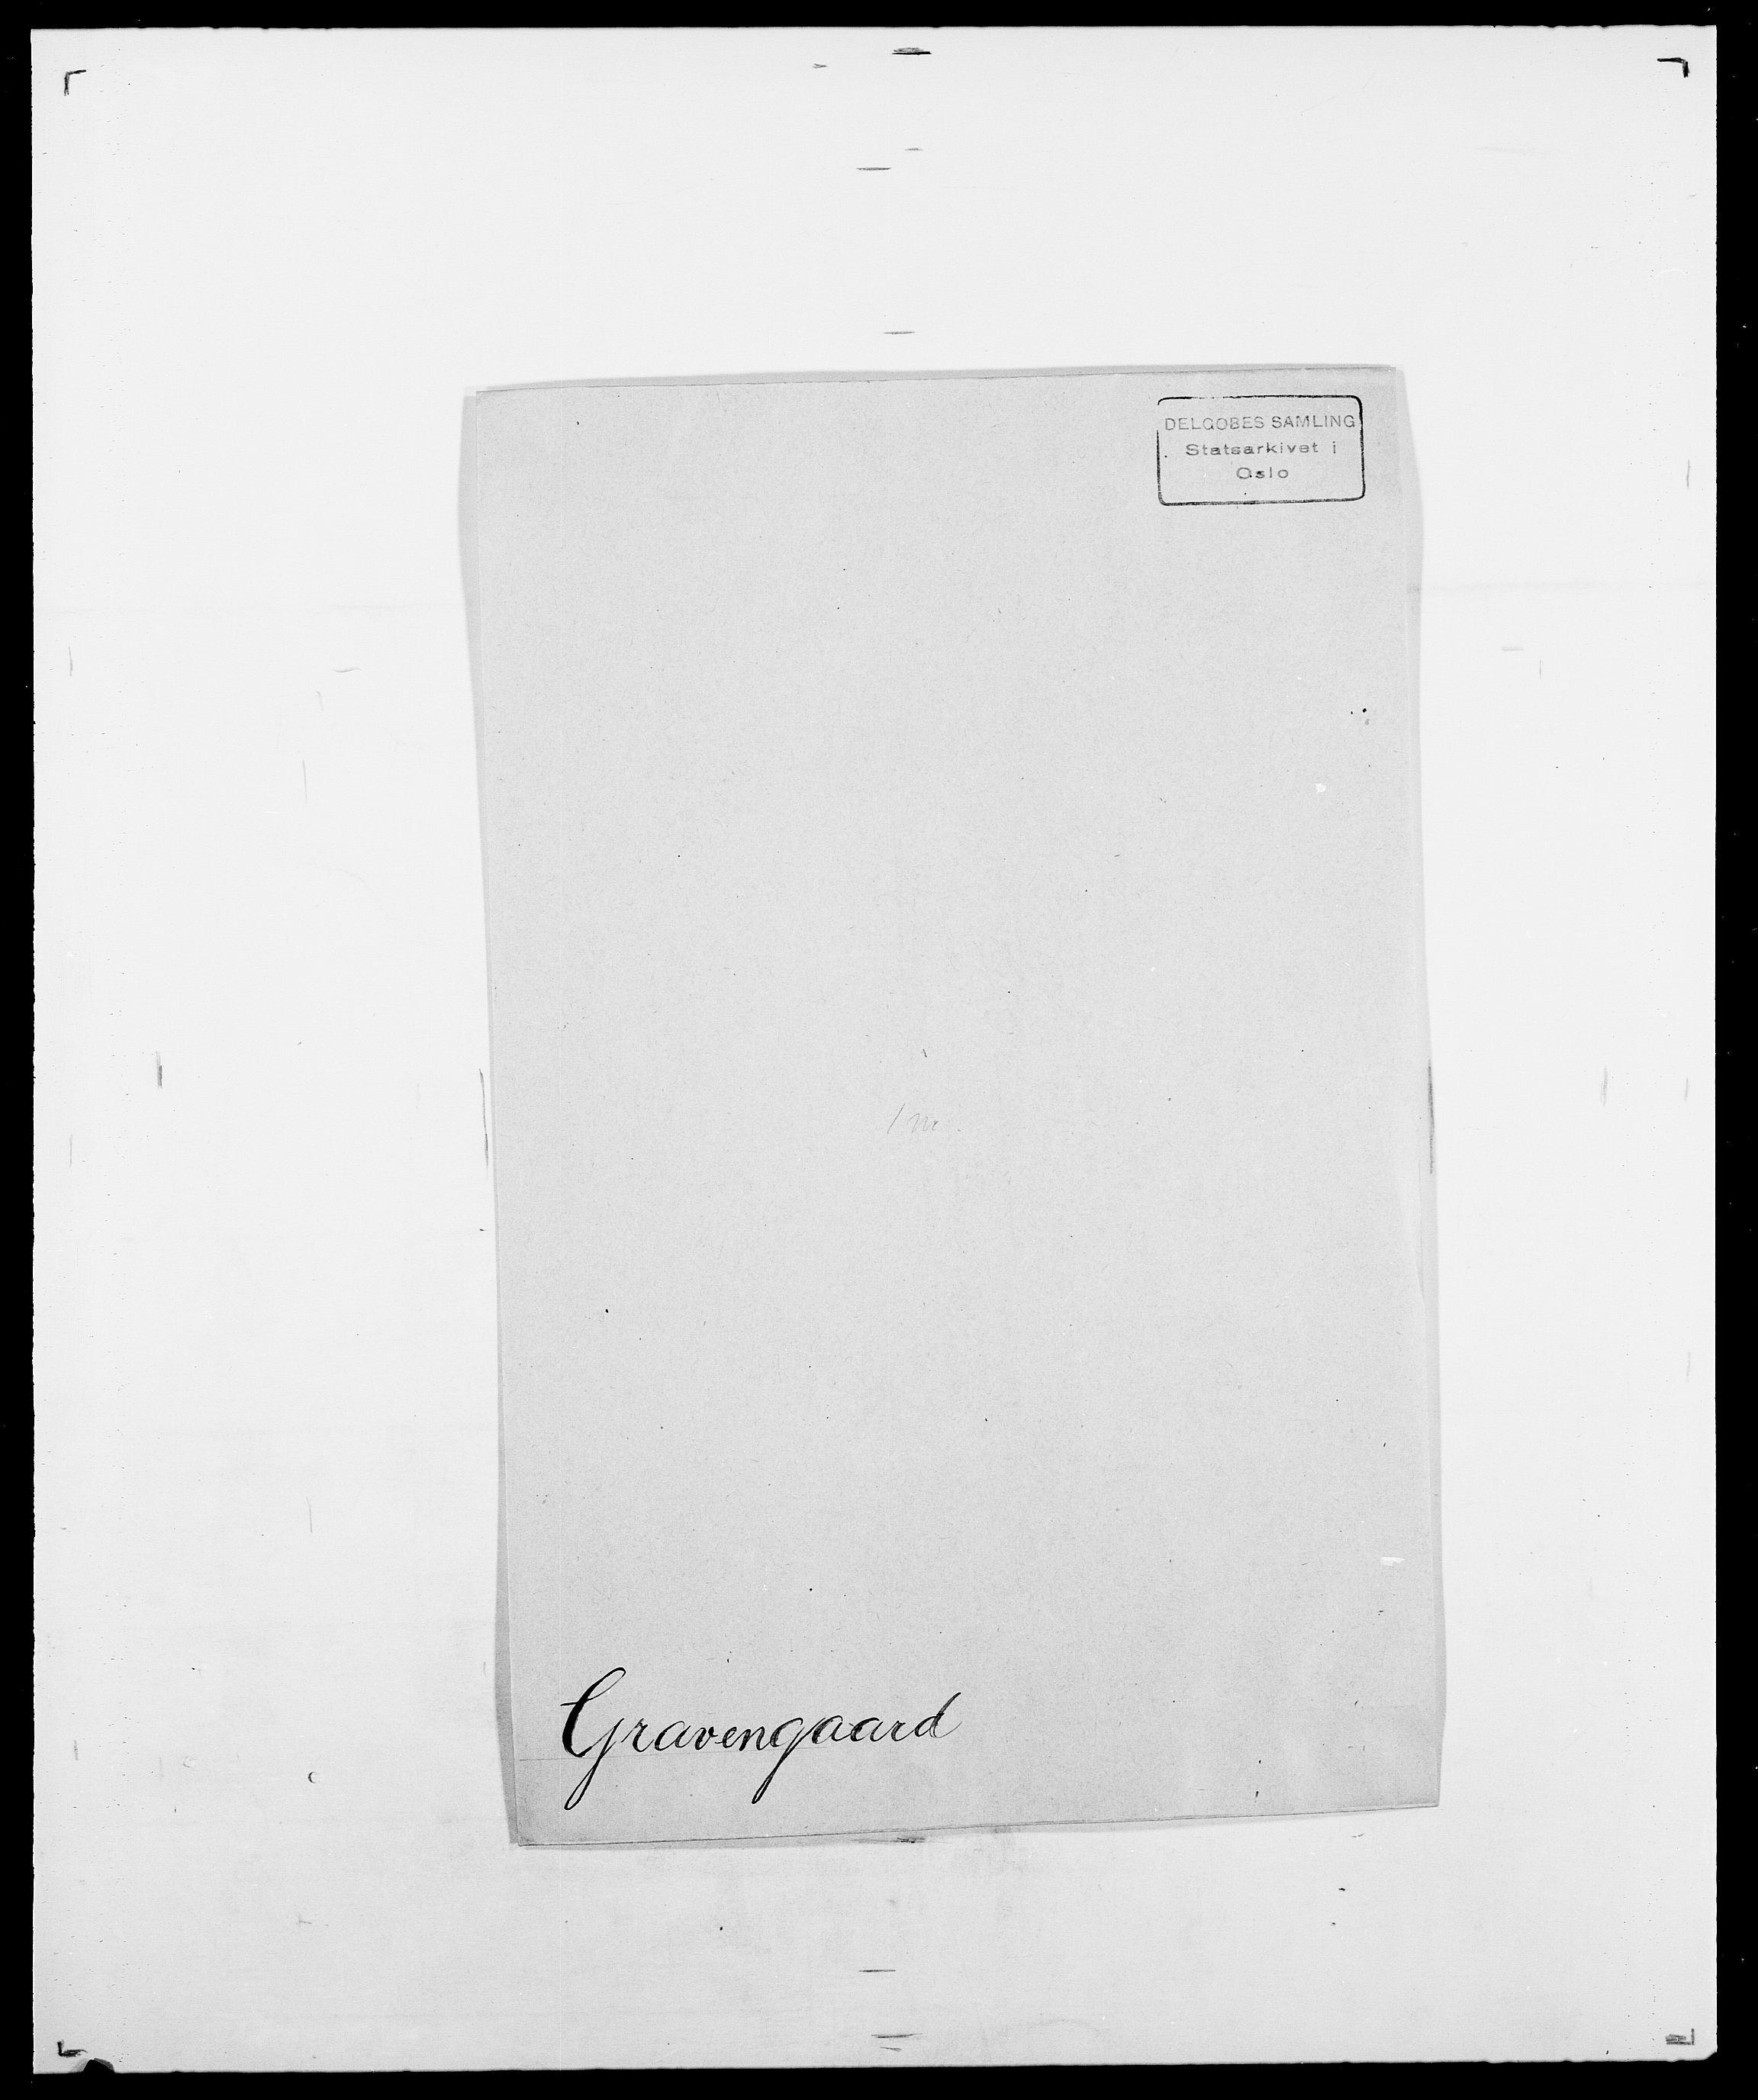 SAO, Delgobe, Charles Antoine - samling, D/Da/L0014: Giebdhausen - Grip, s. 562